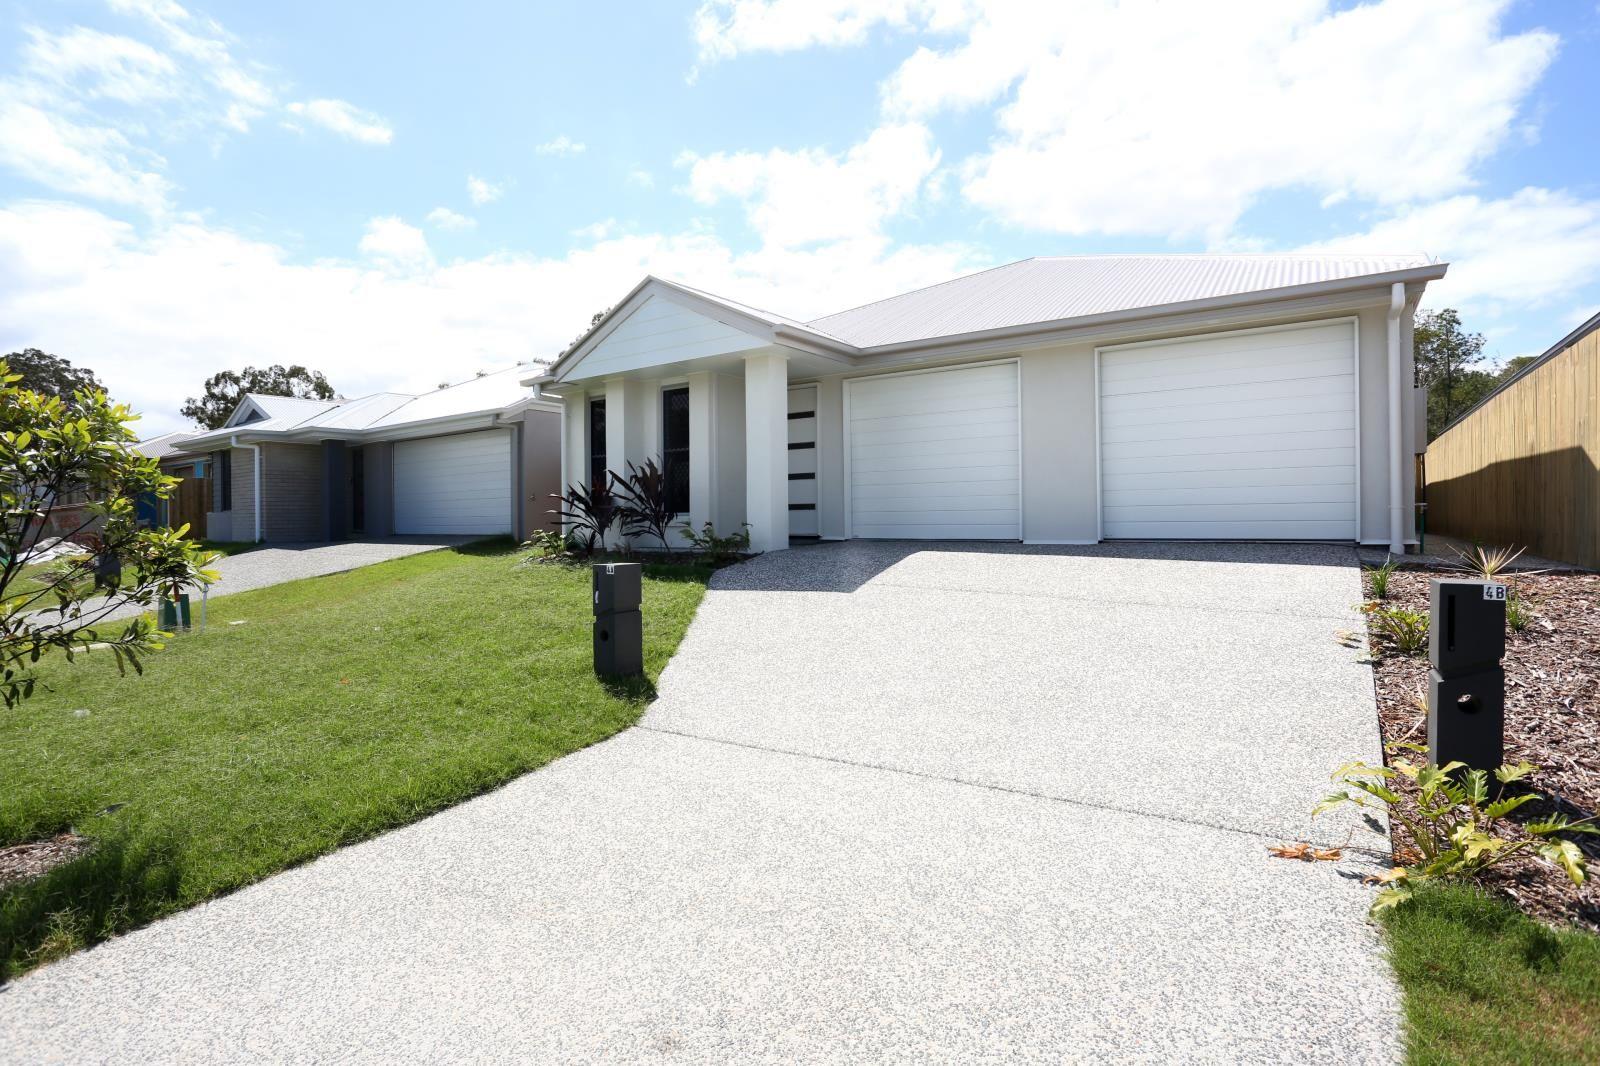 1/4 Havenswood Street, Burpengary QLD 4505, Image 0